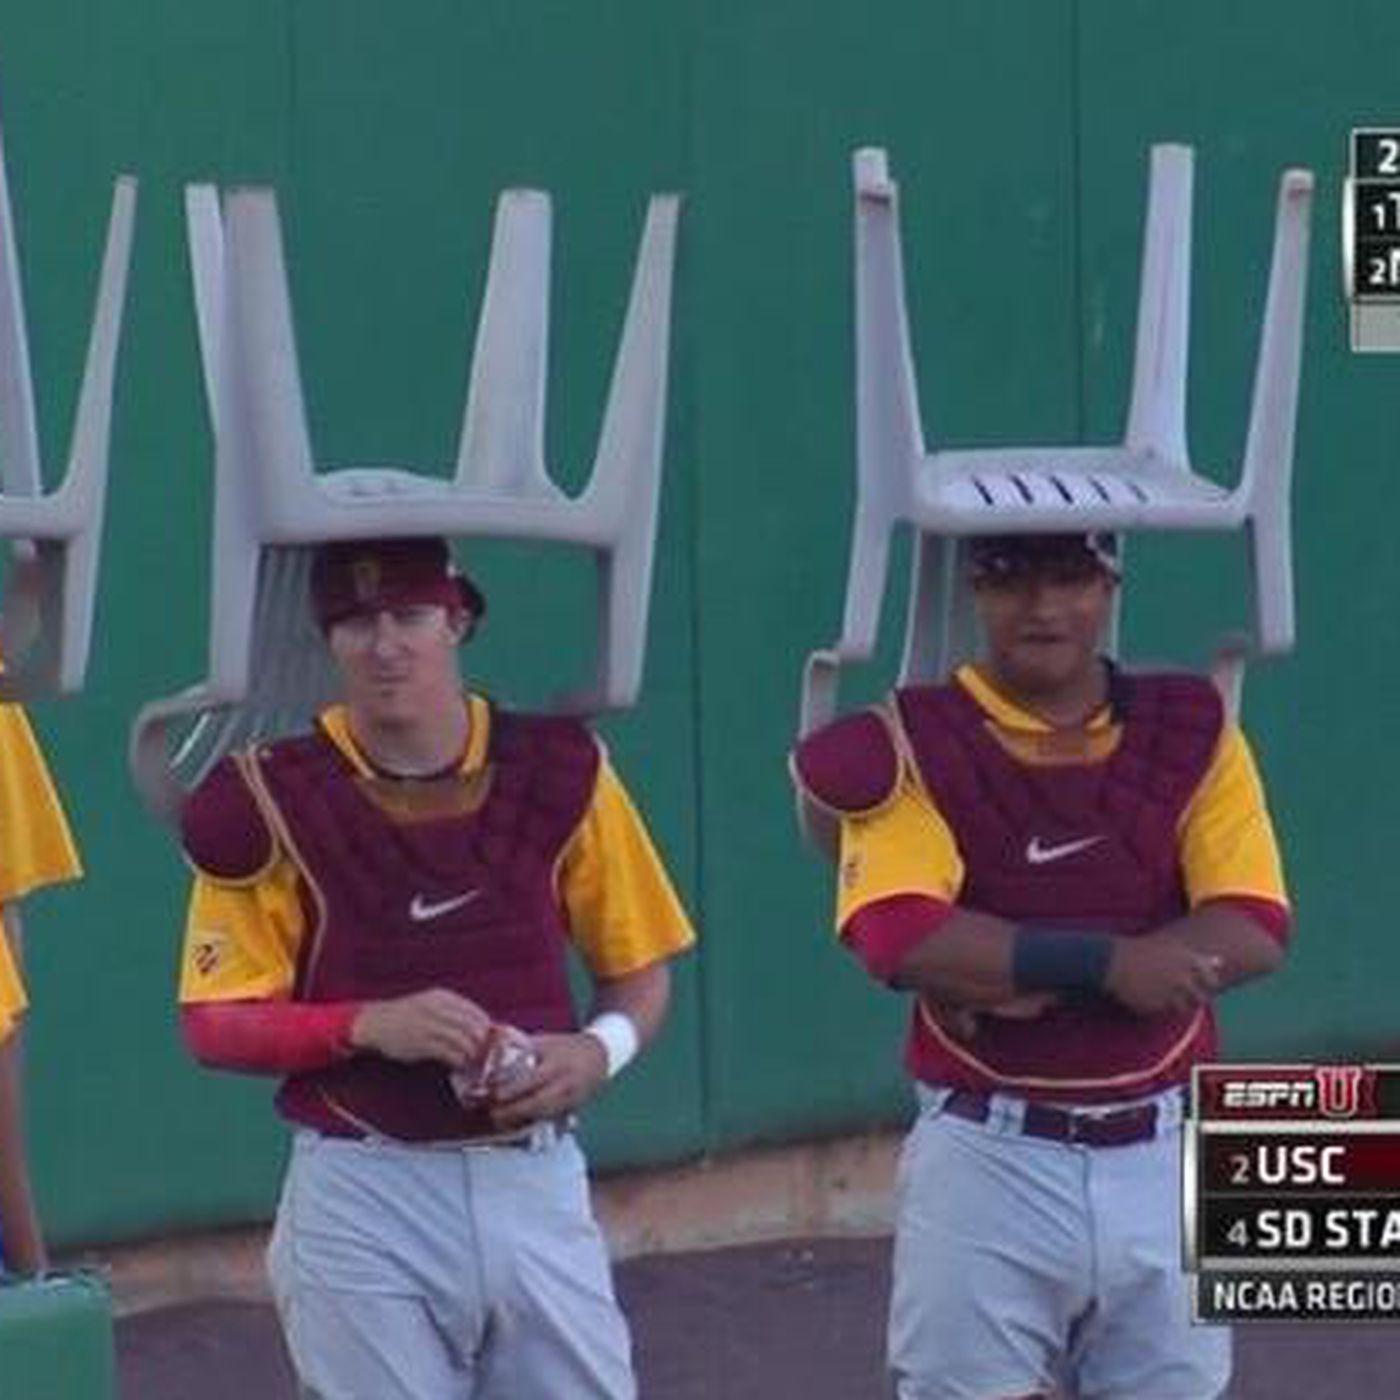 USC baseball breaks out rally lawn chair hats - SBNation com